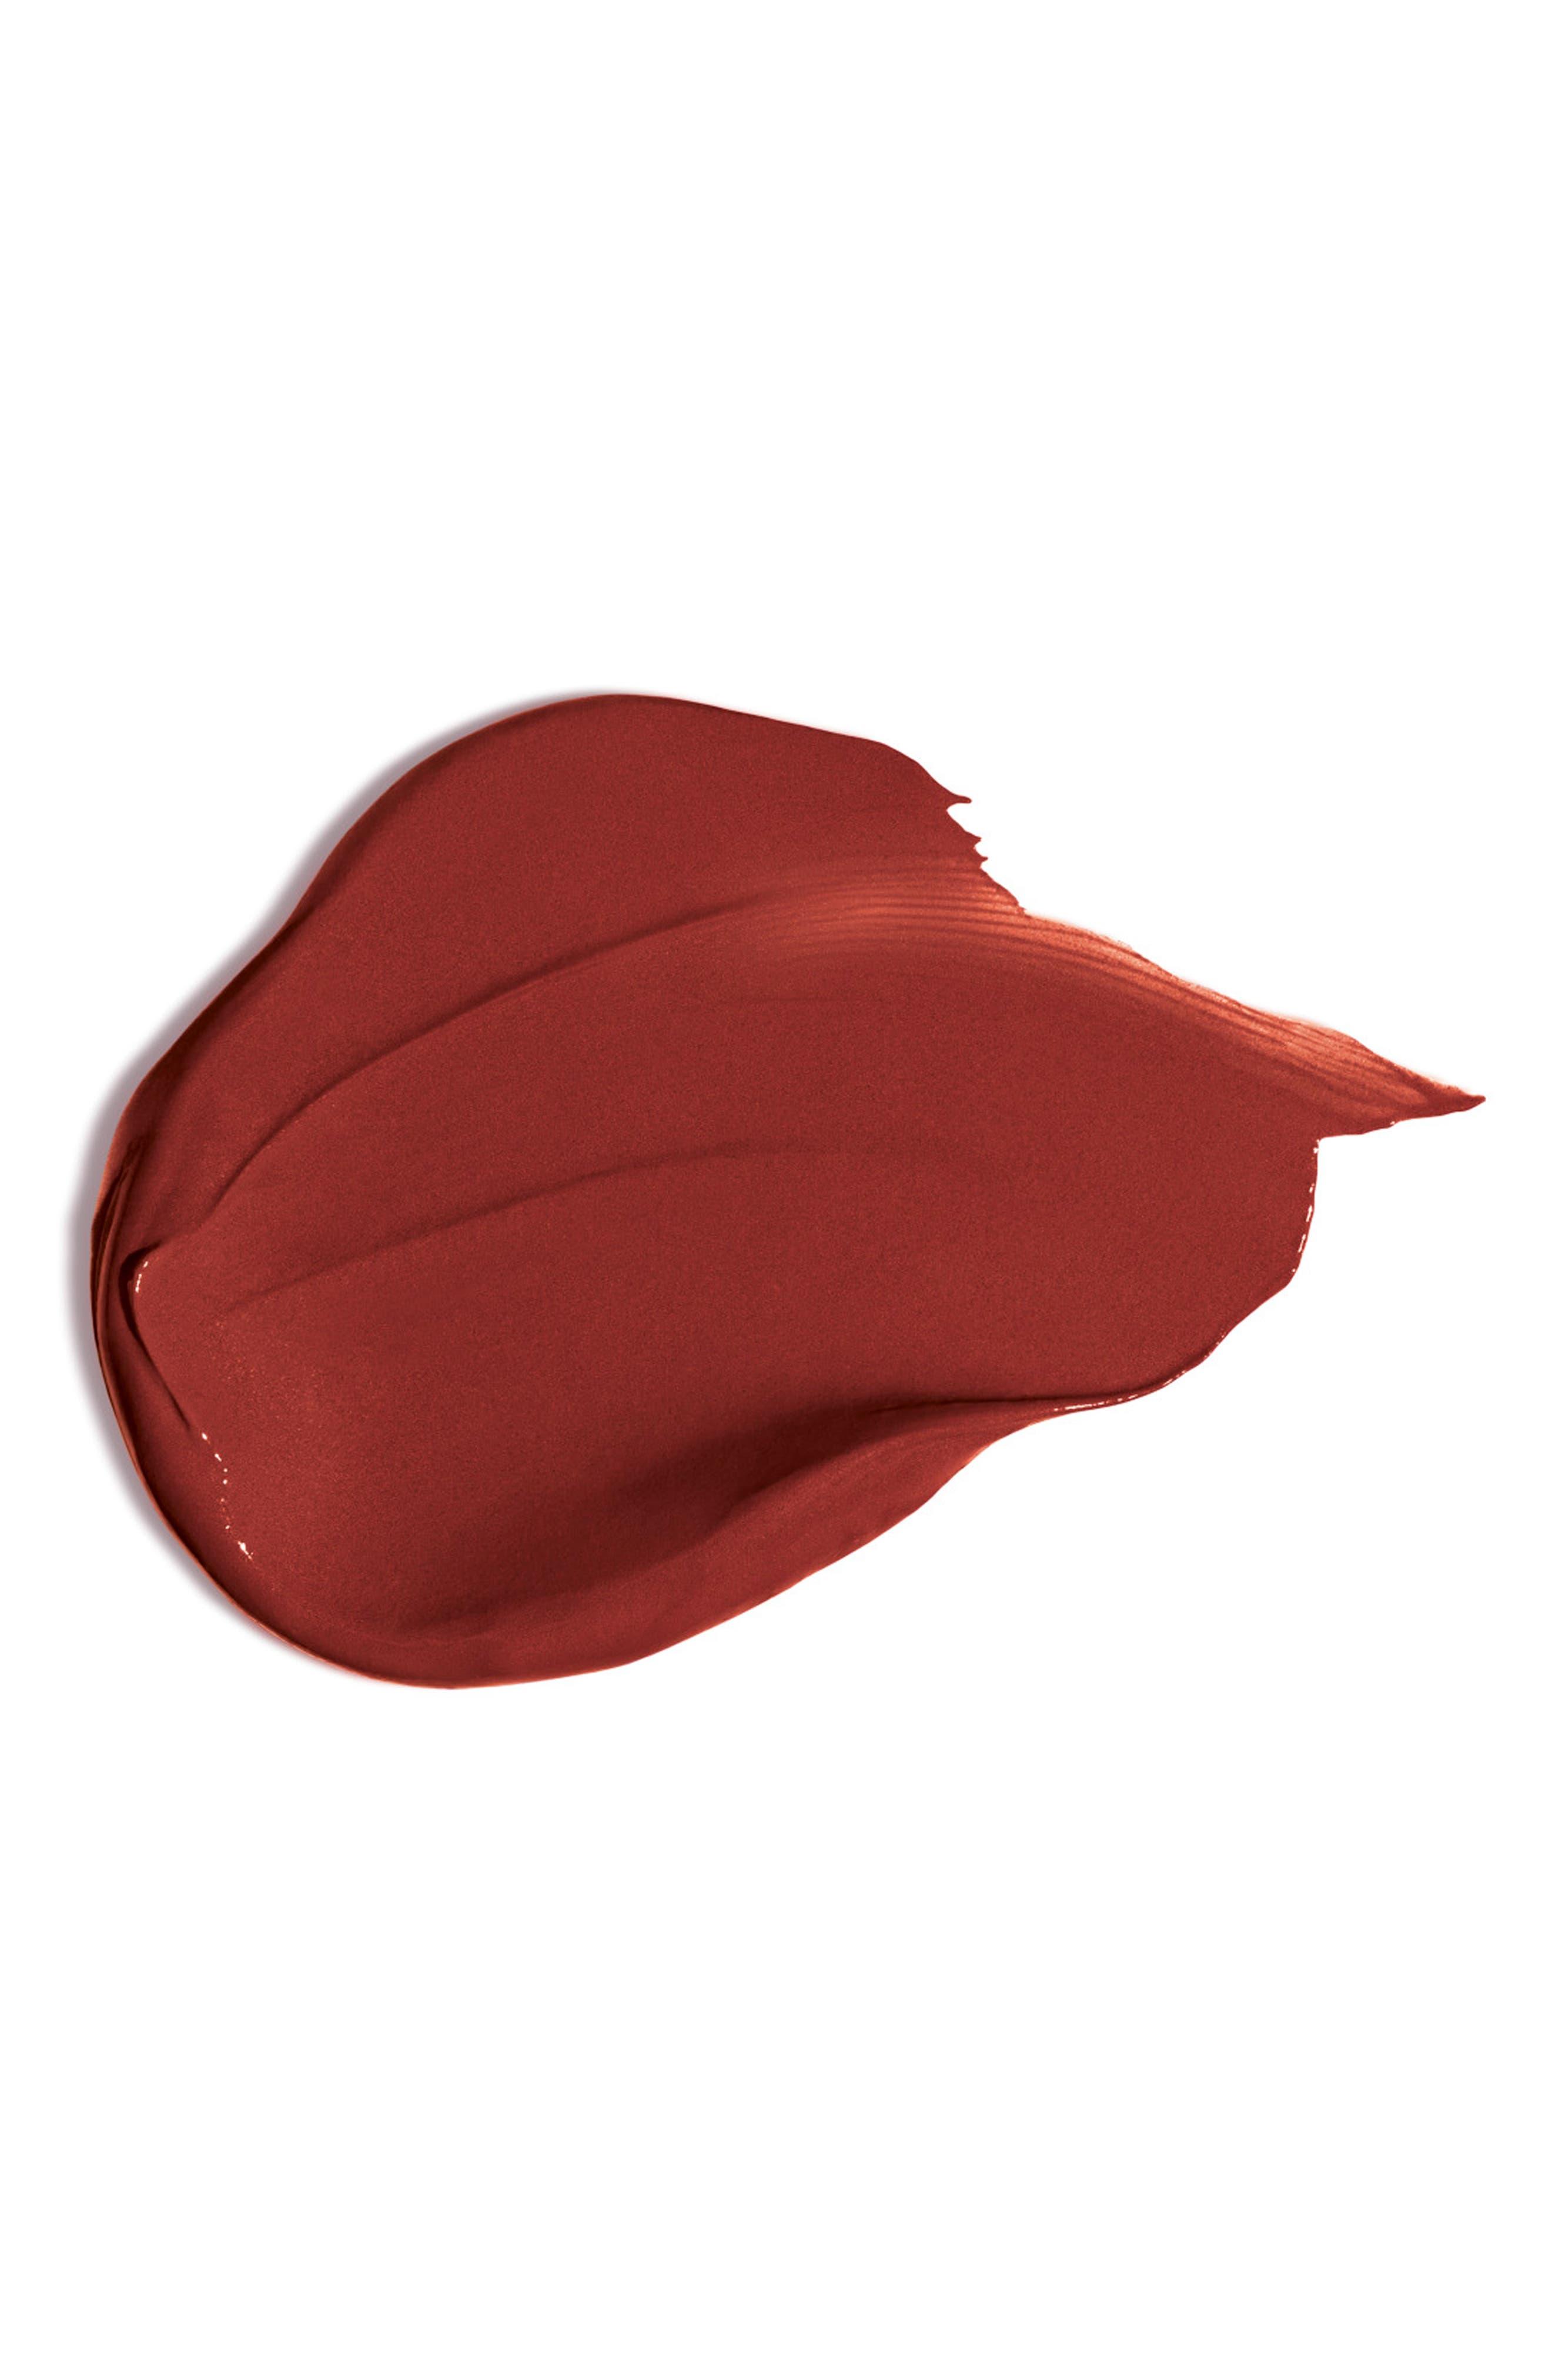 CLARINS, Joli Rouge Velvet Matte Lipstick, Alternate thumbnail 2, color, 737 SPICY CINNAMON